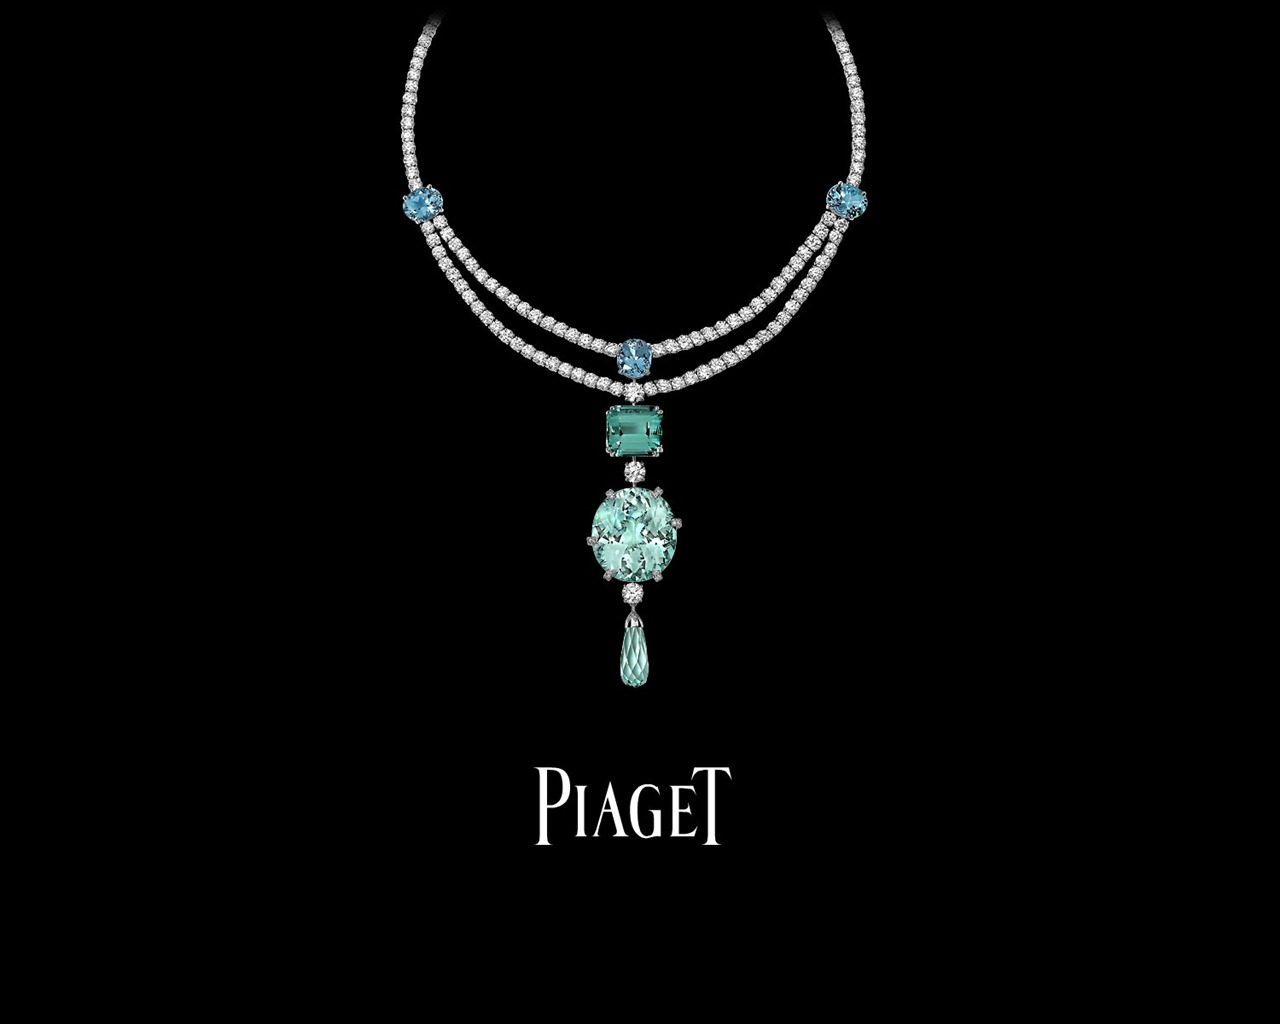 Piaget diamond jewelry ring wallpaper-third series 19 - 1280x1024 ...